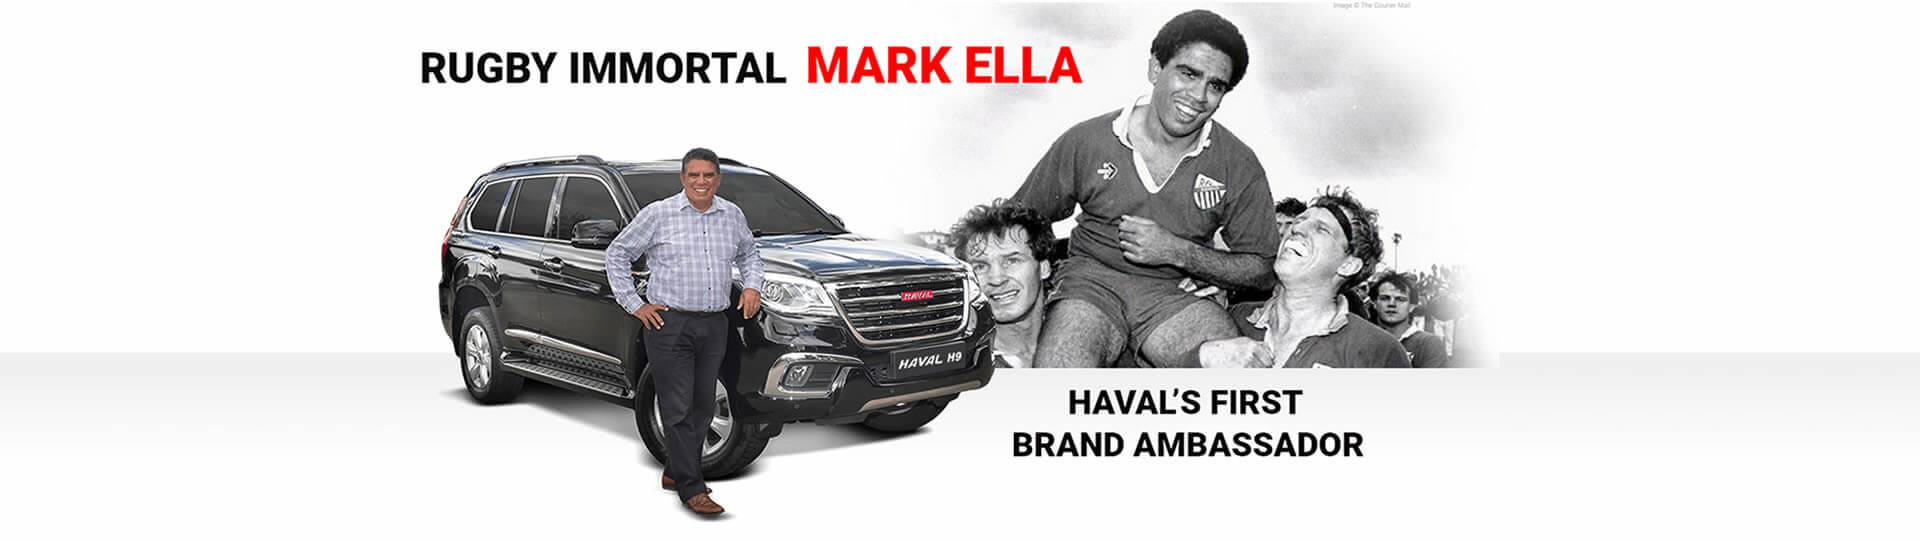 HAVAL Ambassador